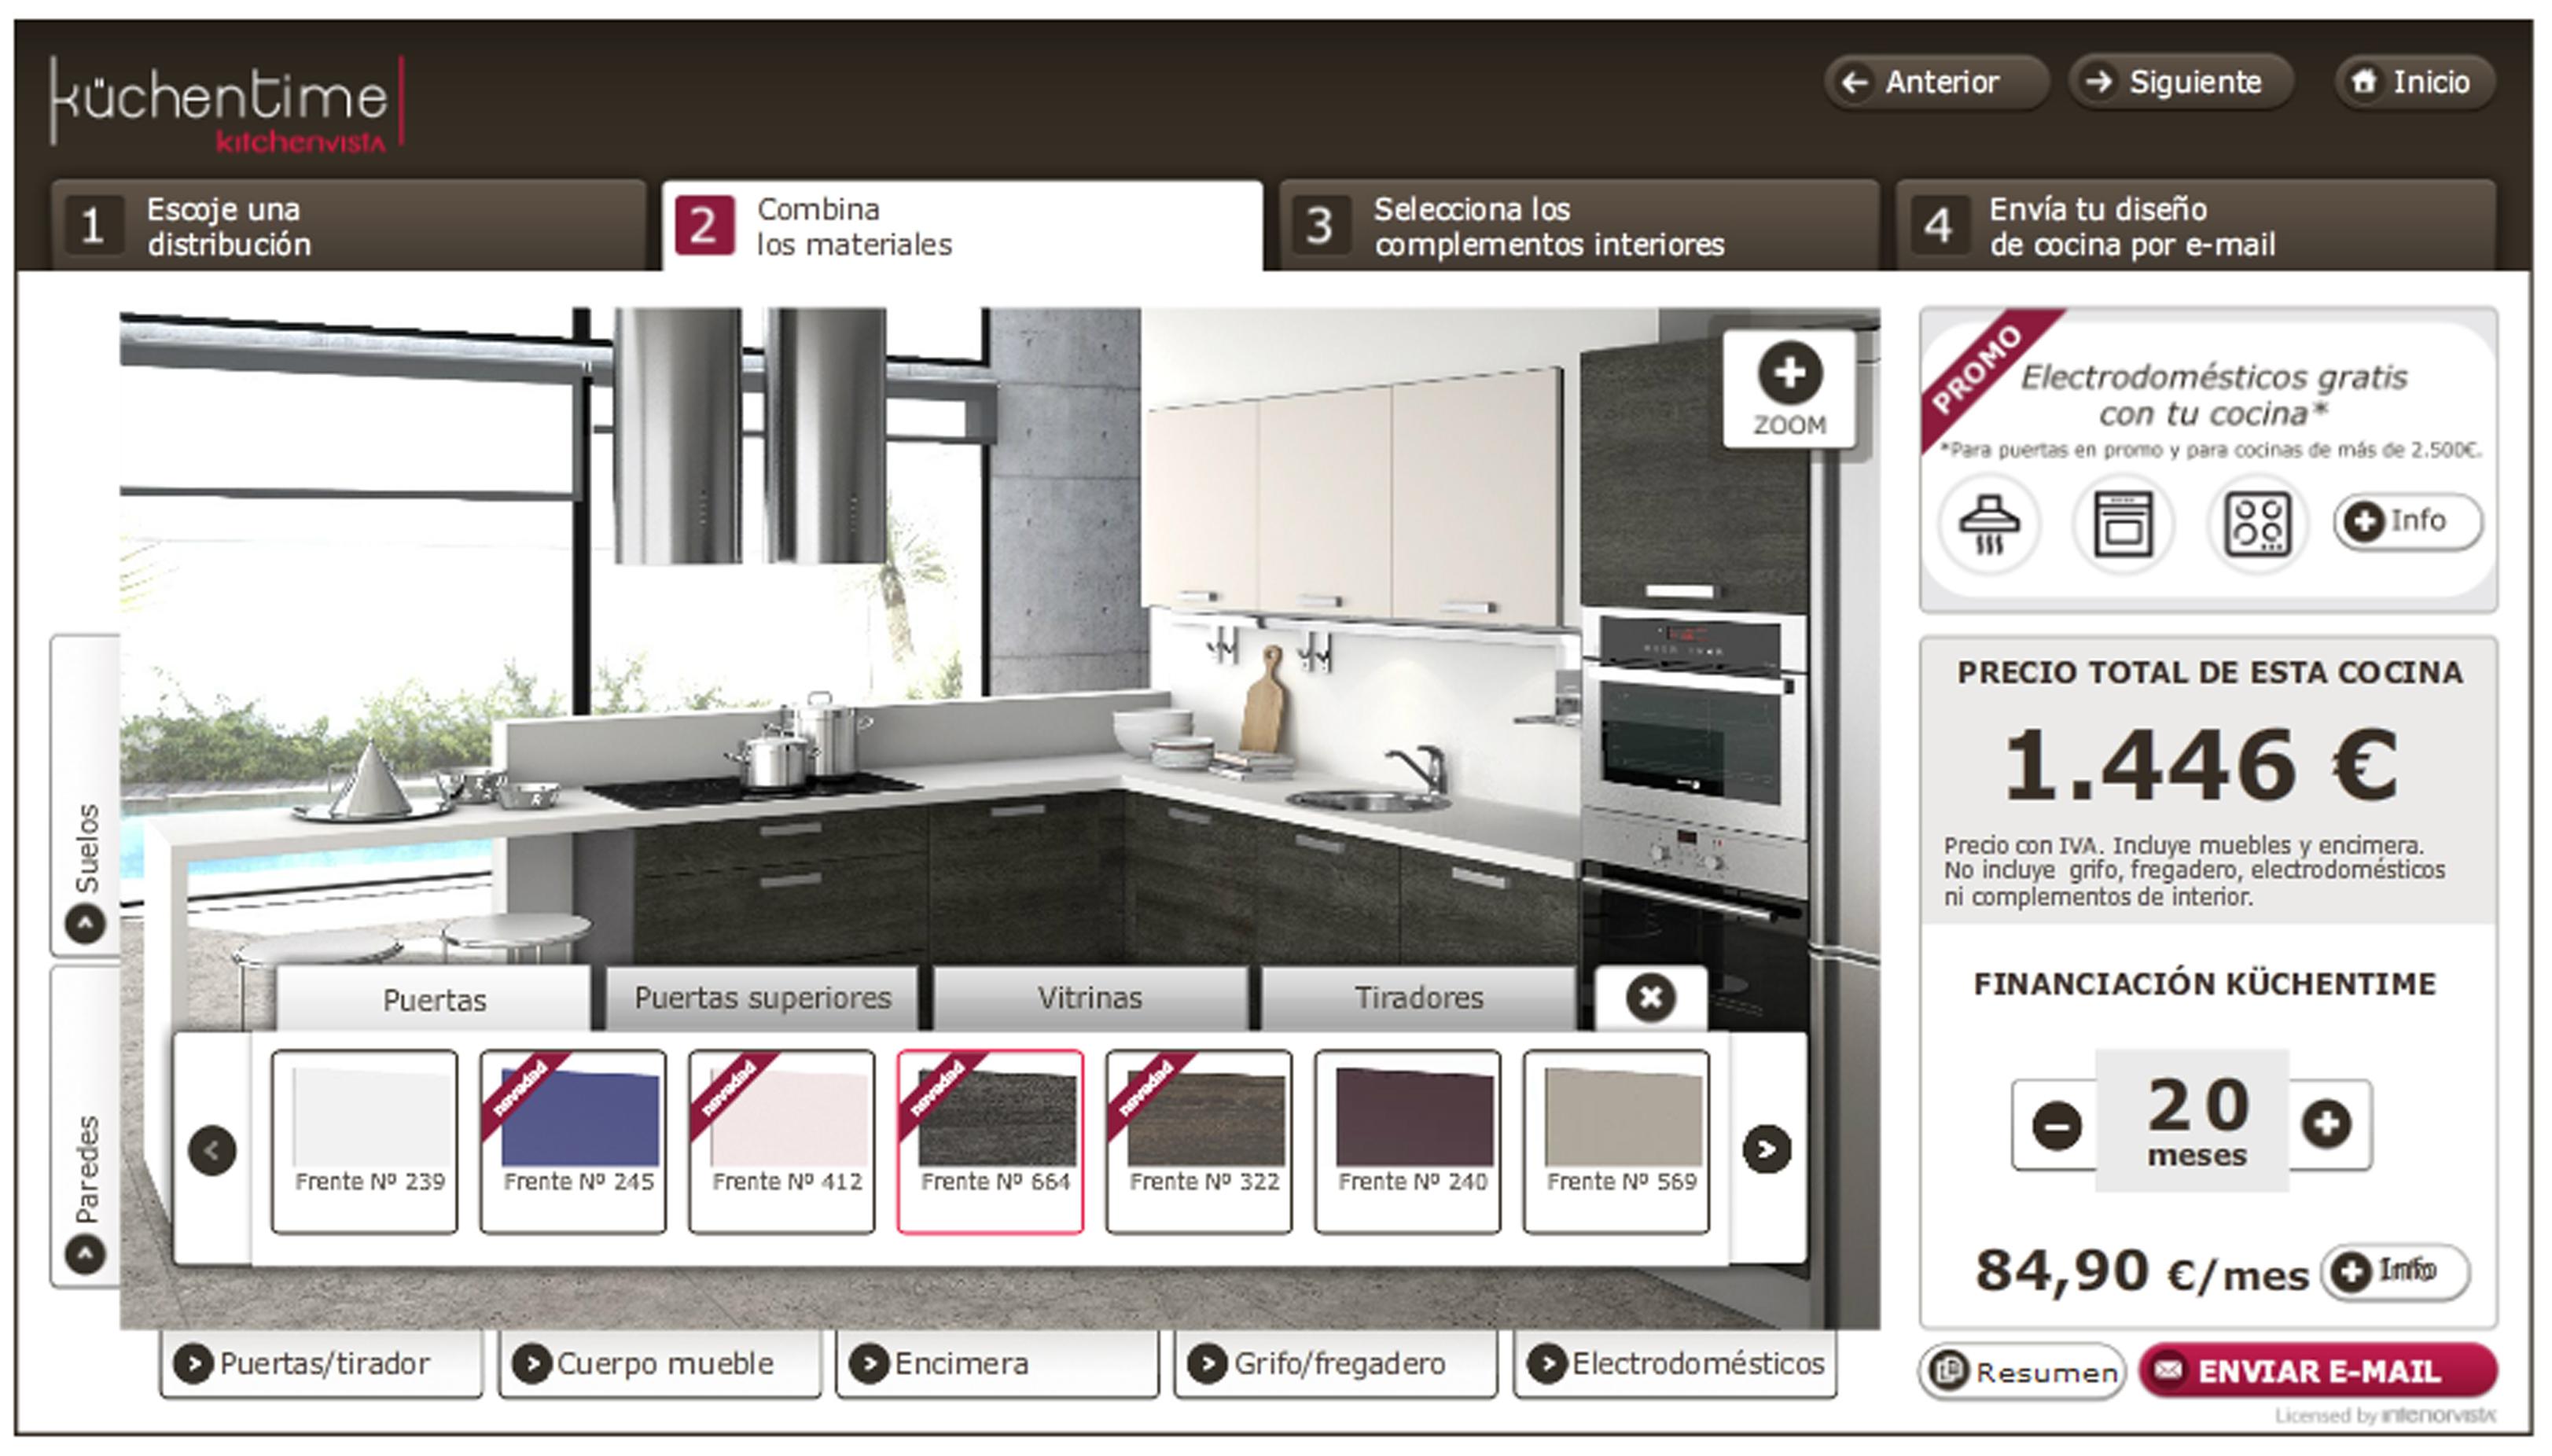 Dise a tu cocina online casa dise o casa dise o for Disena tu mueble online